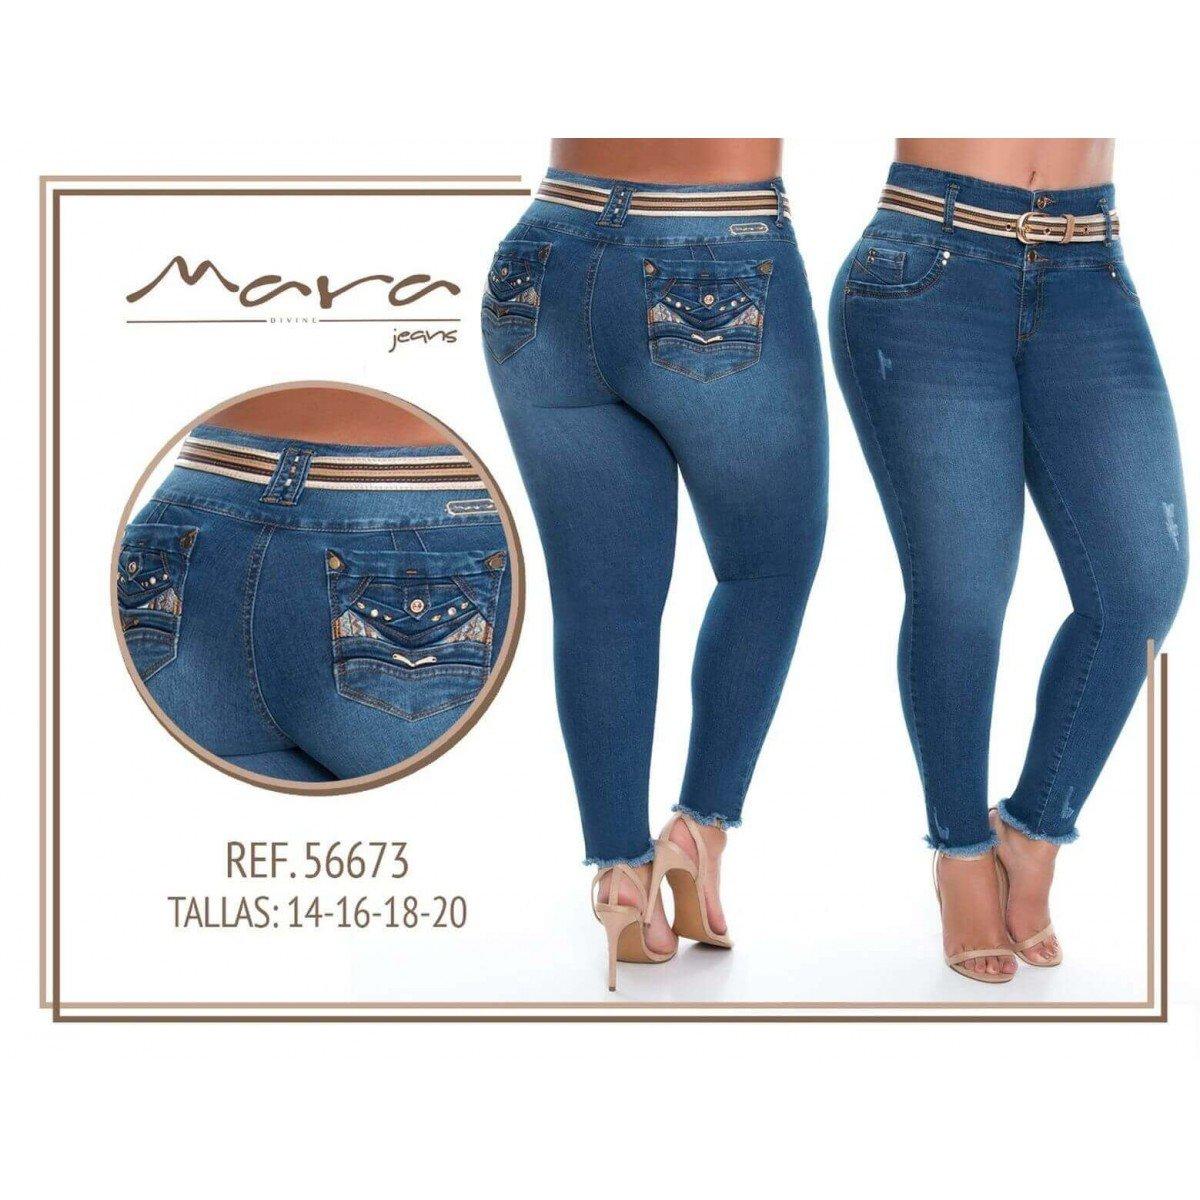 Pantalon Talla Grande Mara Jeans 56673